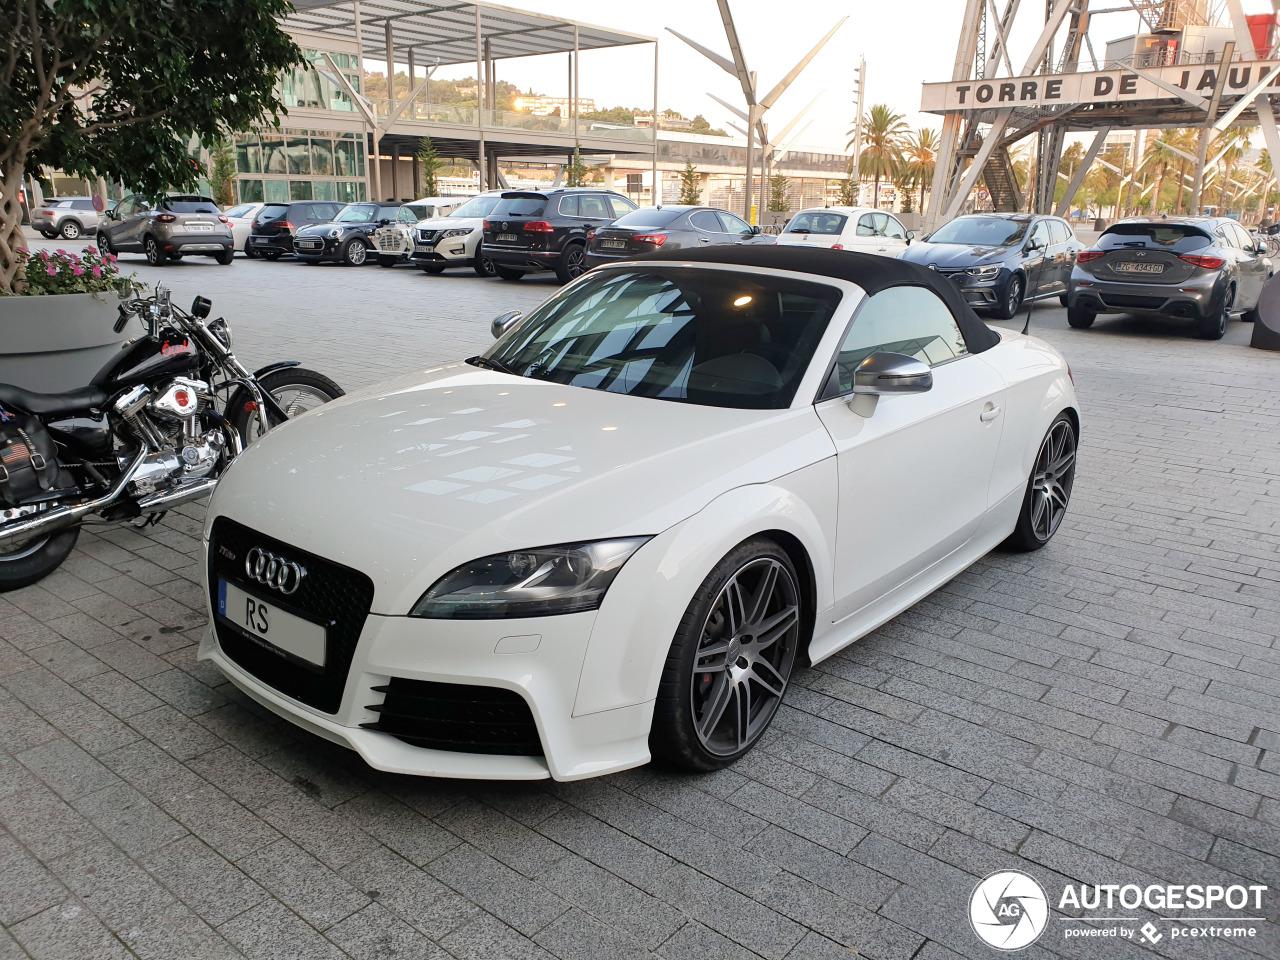 Audi TT-RS Roadster - 23 August 2019 - Autogespot